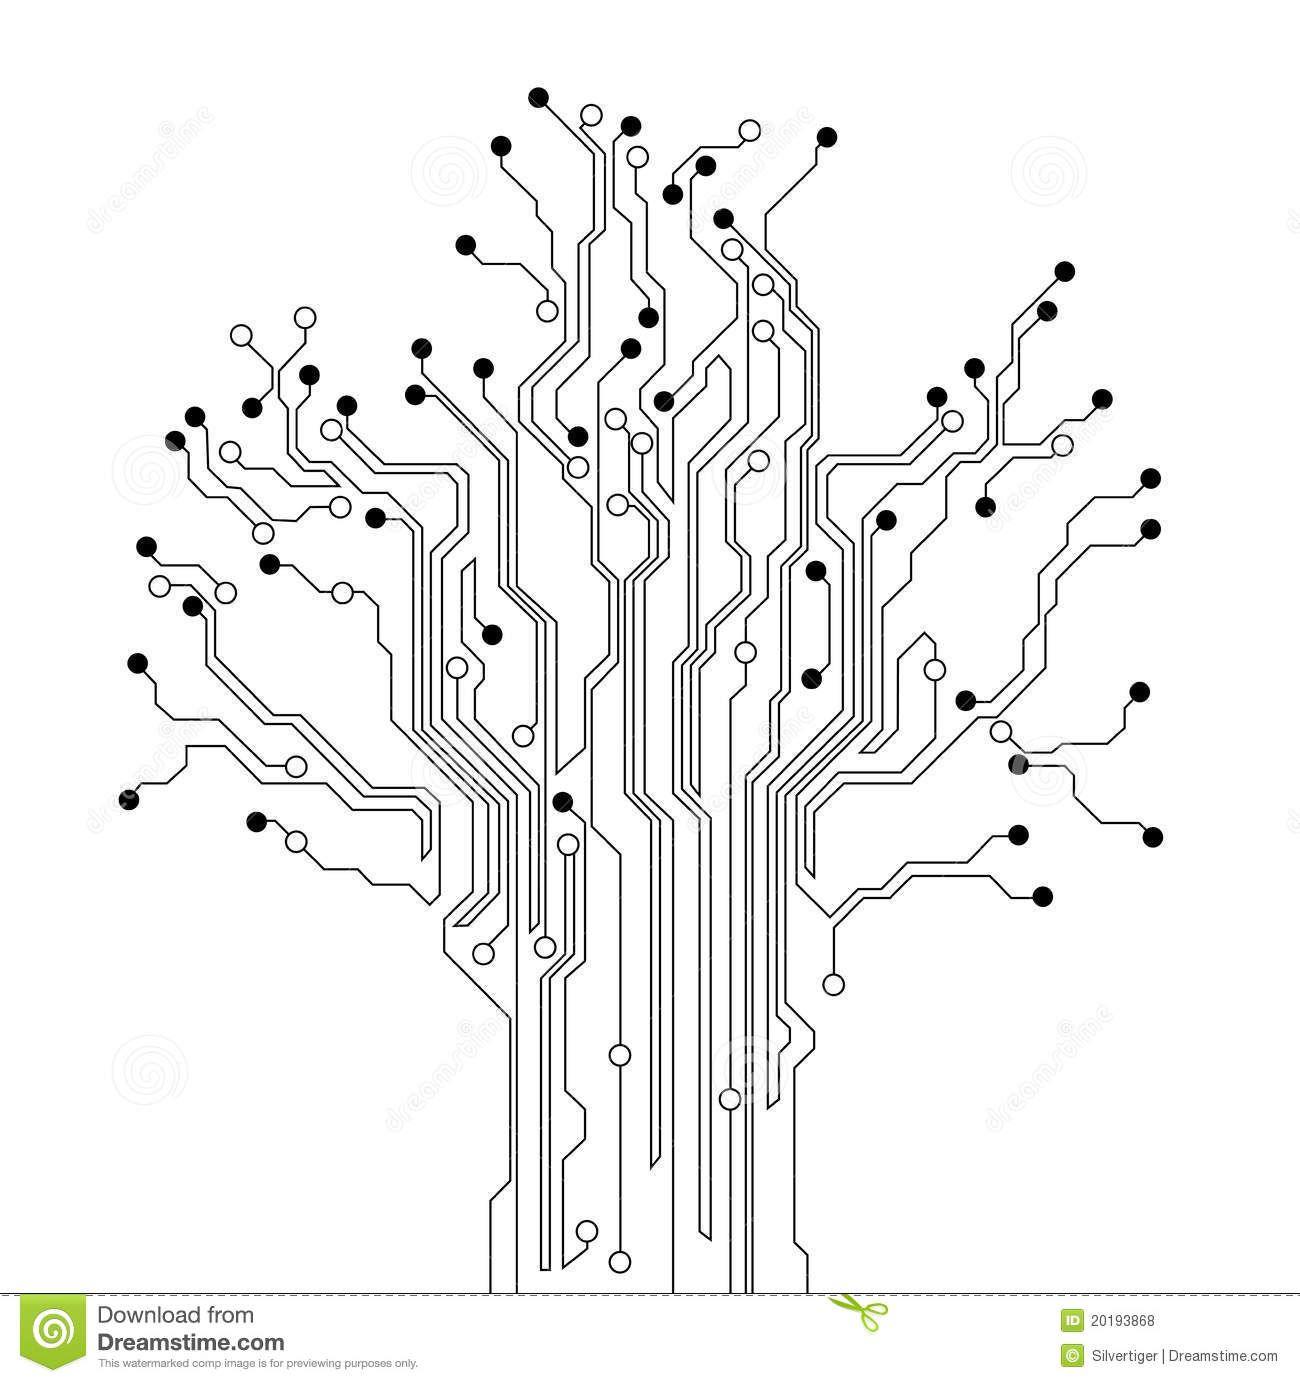 Printed Circuit Board Tree Stock Vector Illustration Of